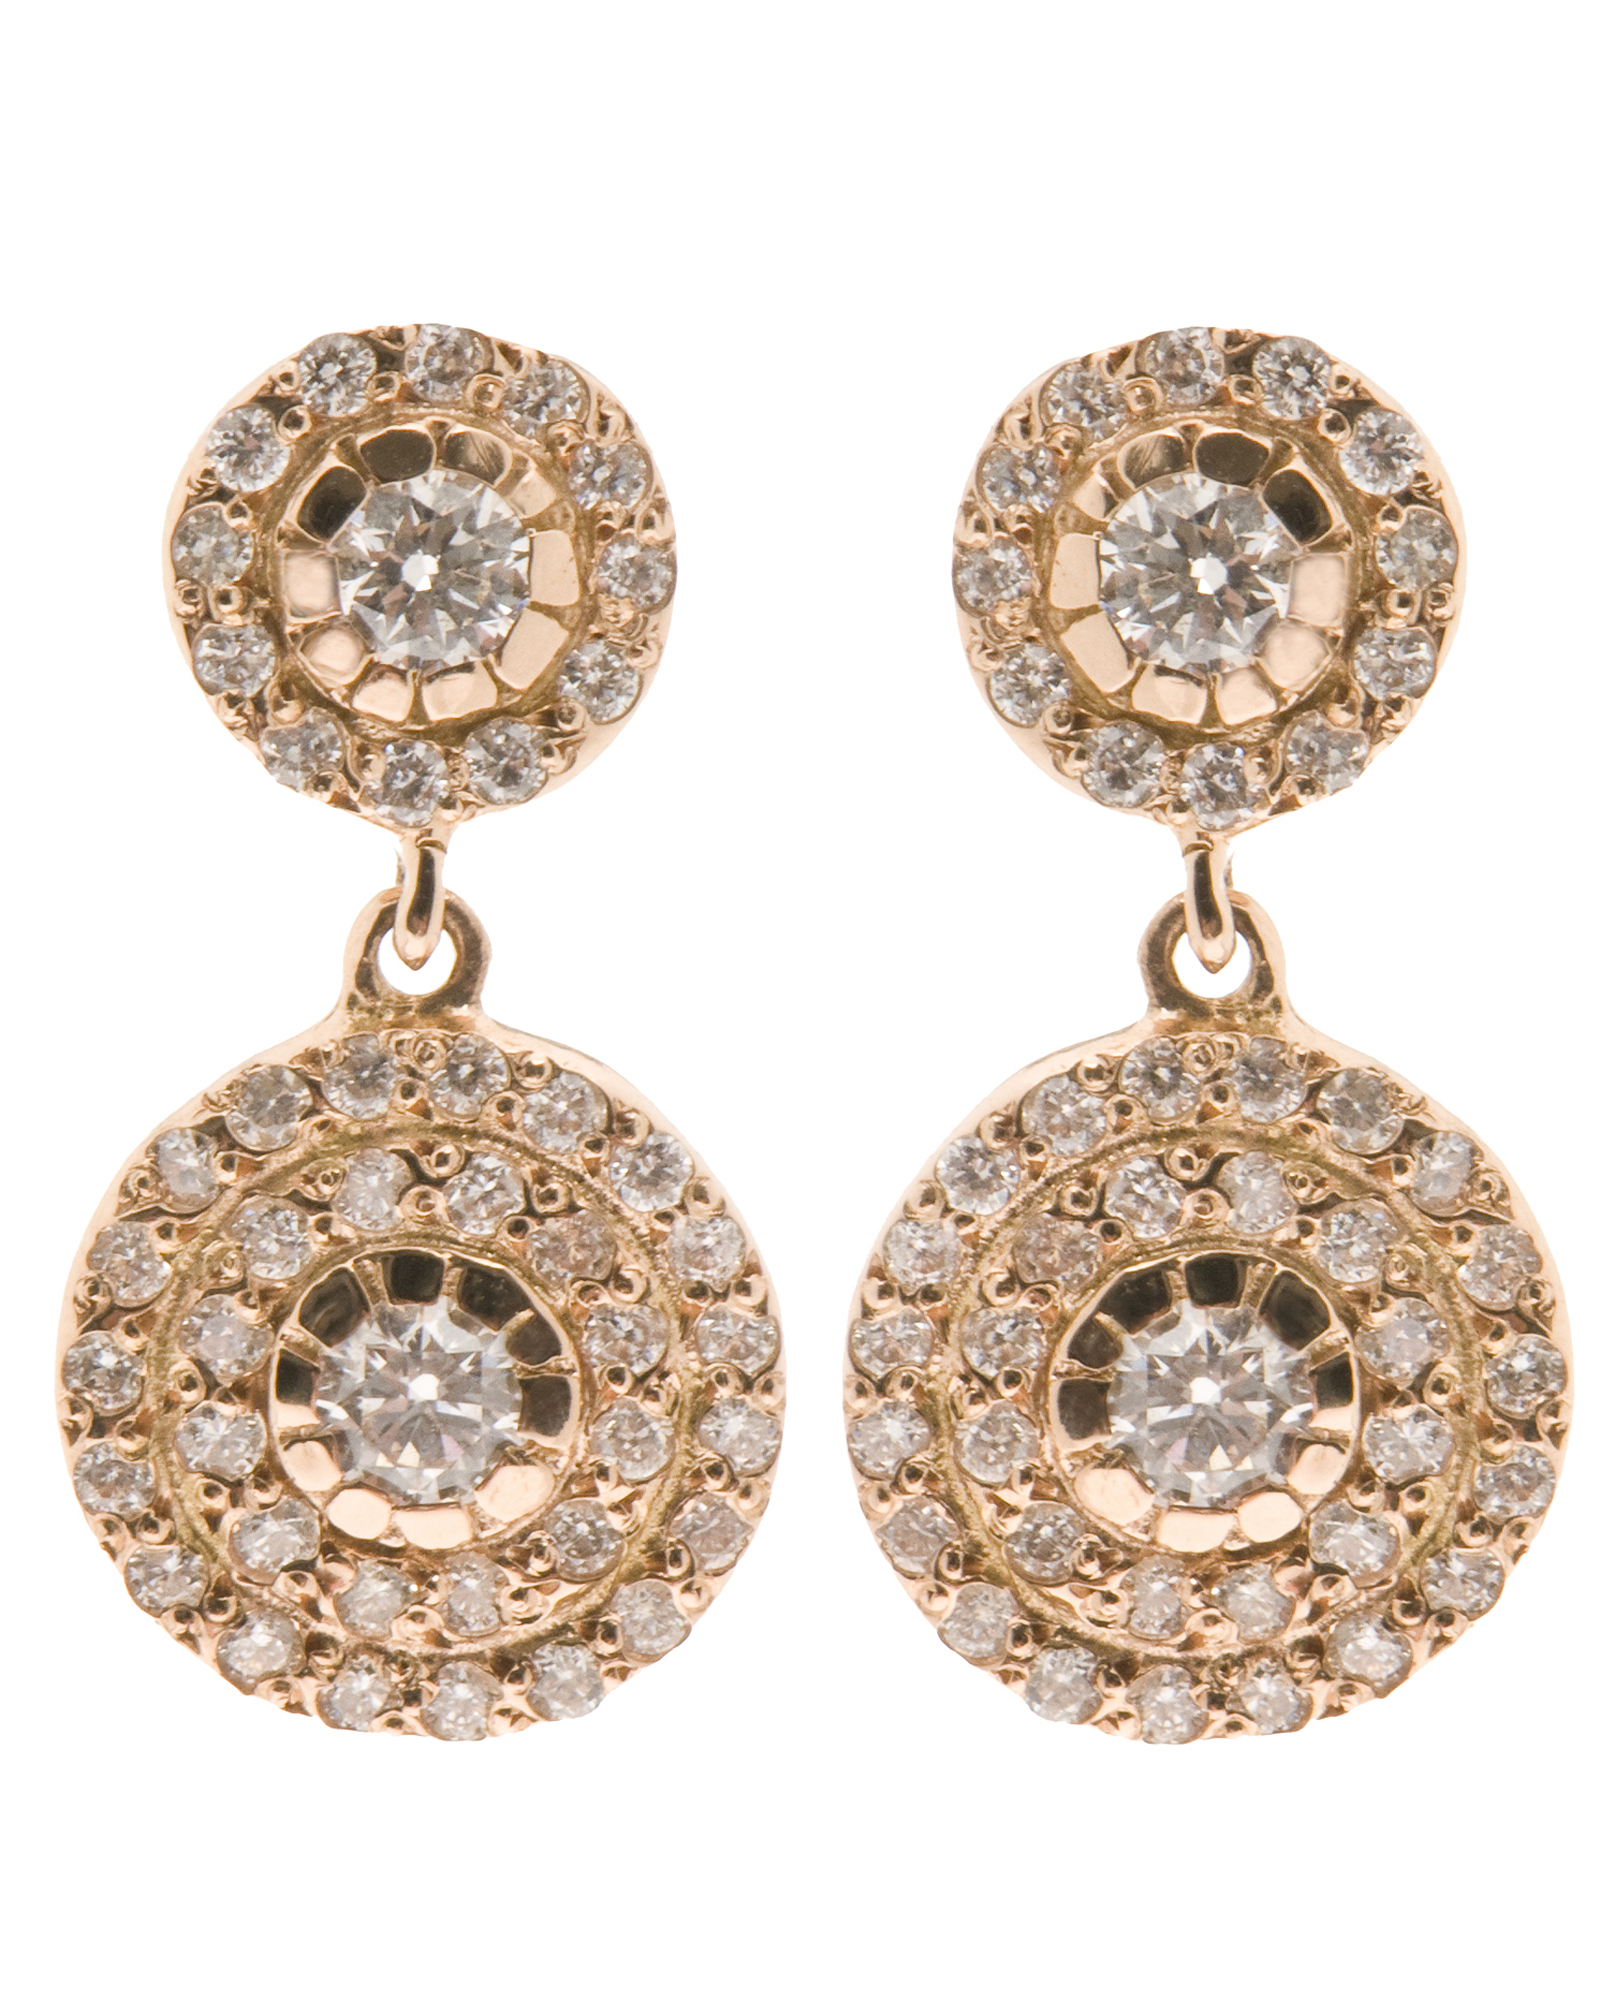 Ileana Makri Double Solitaire Earring in Metallics wk8SNy